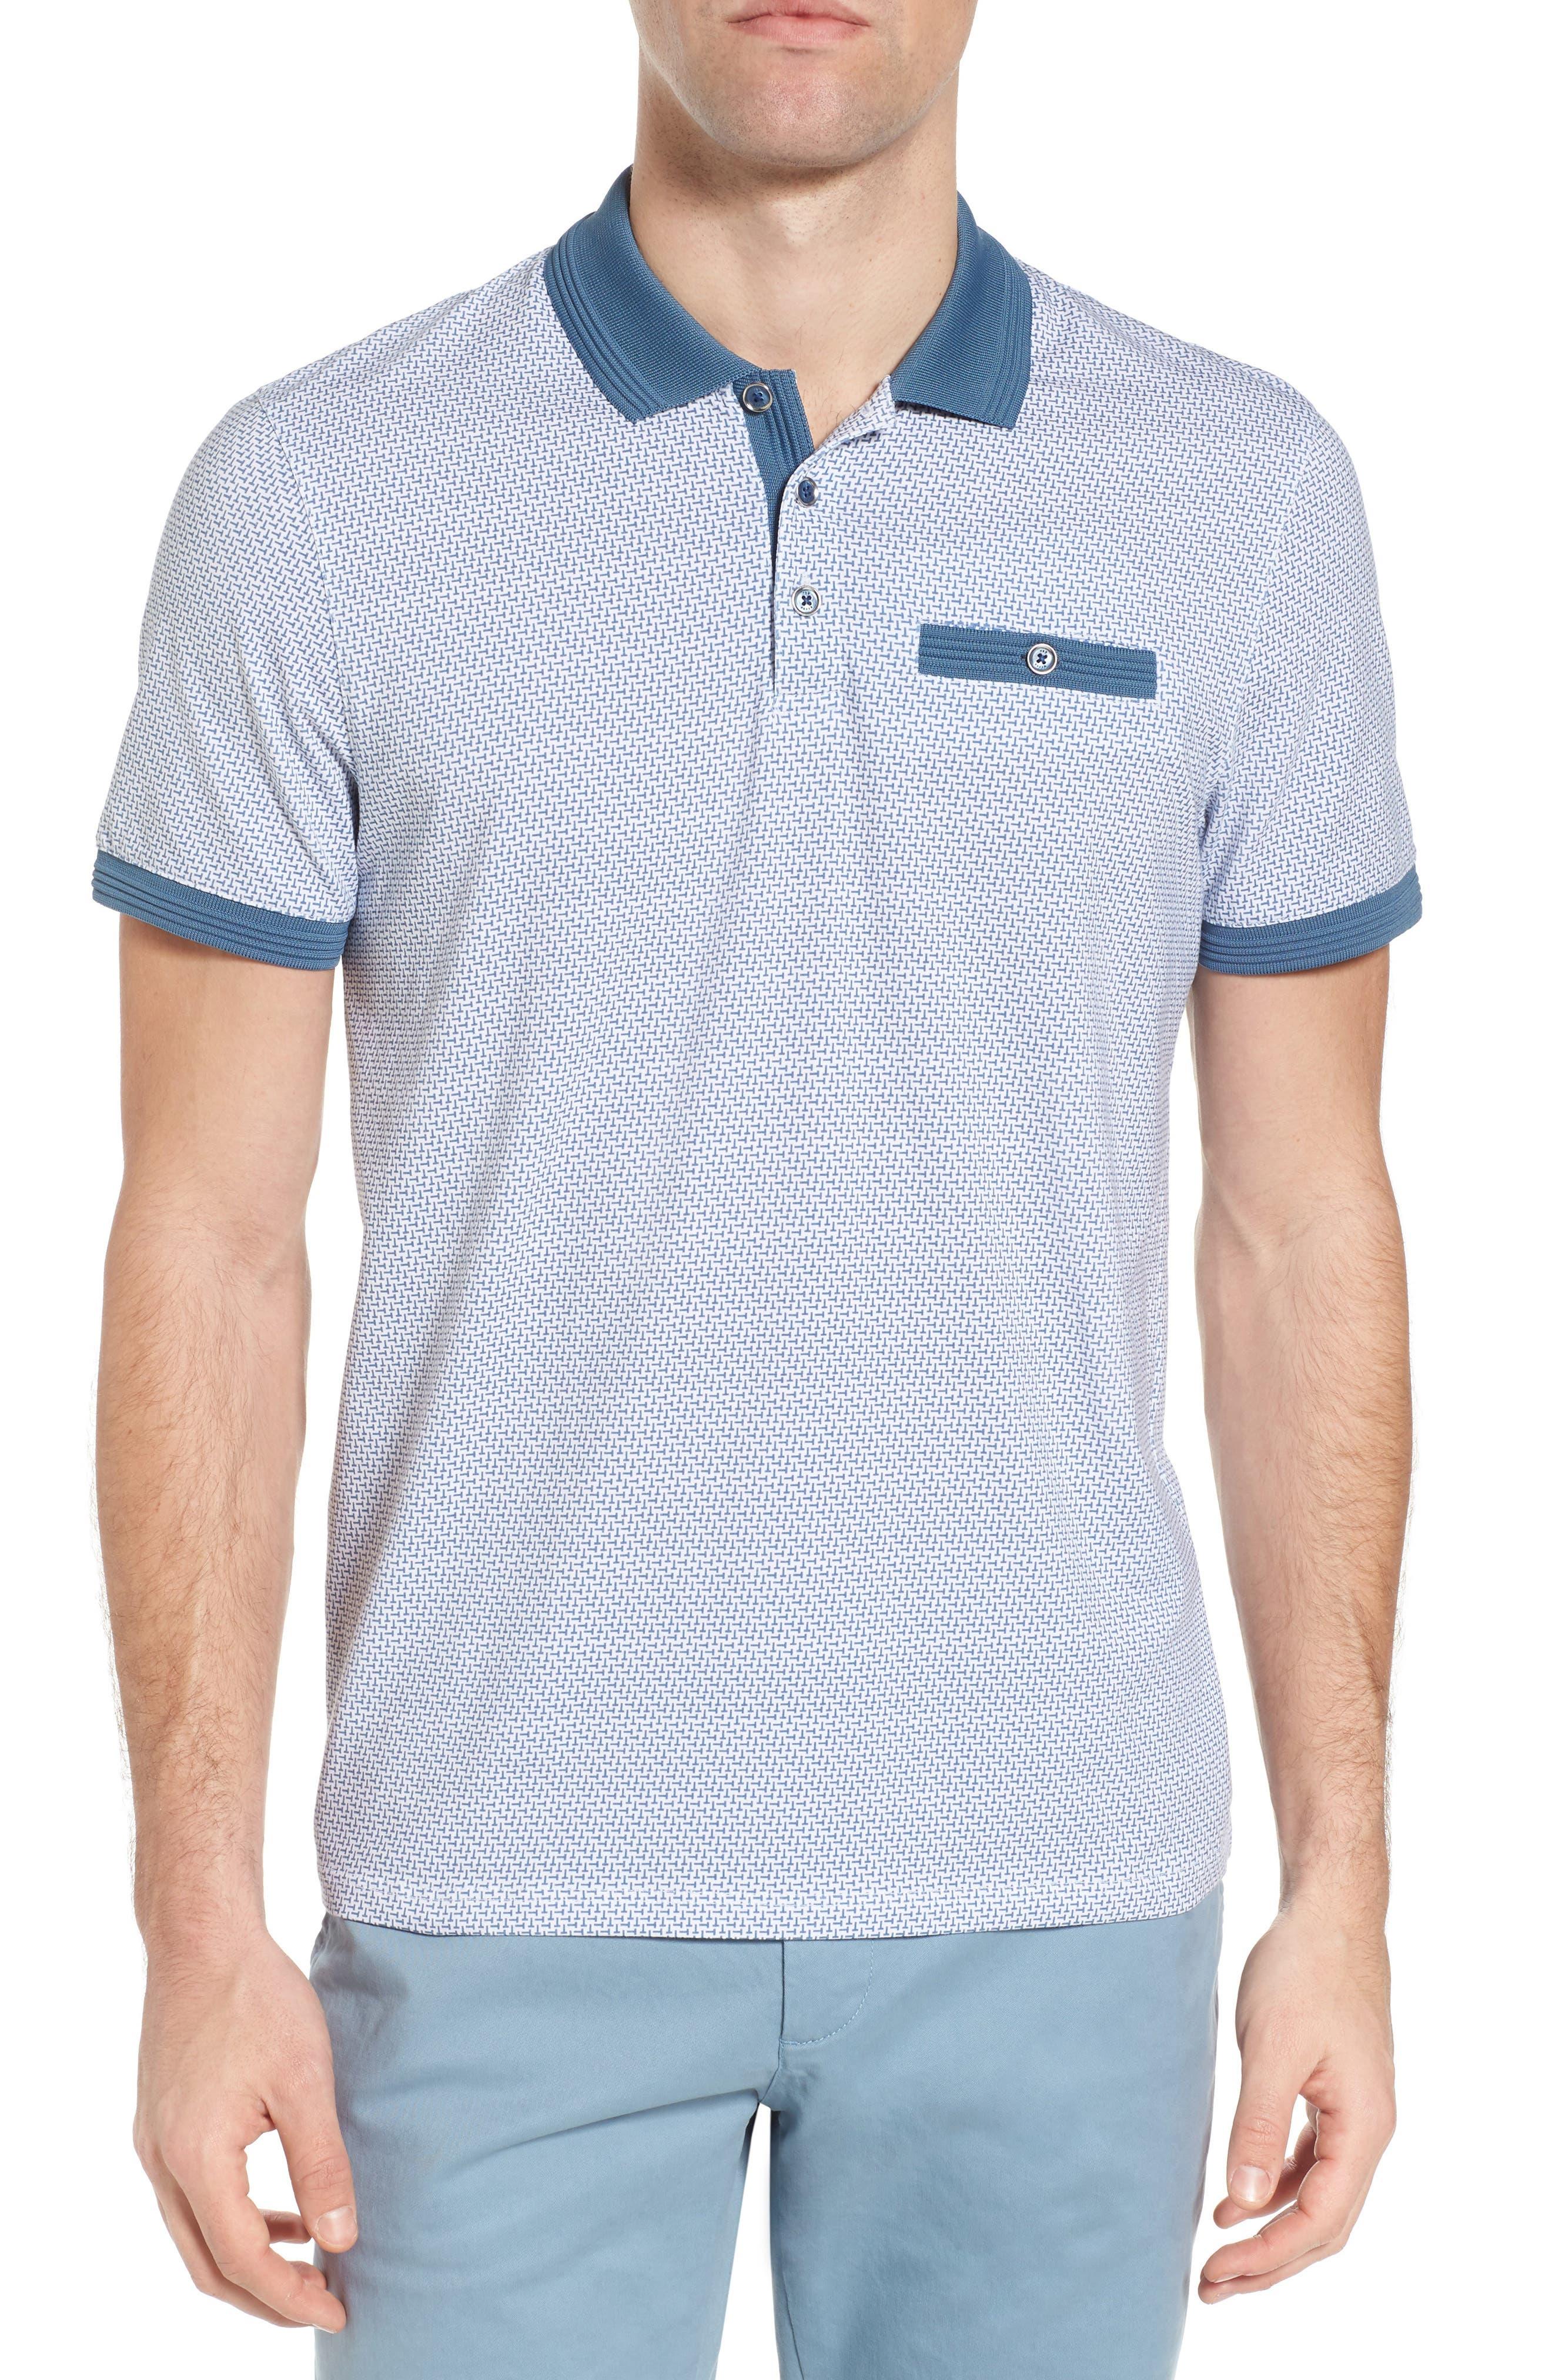 Sloughi Trim Fit Stretch Polo Shirt,                         Main,                         color, 400